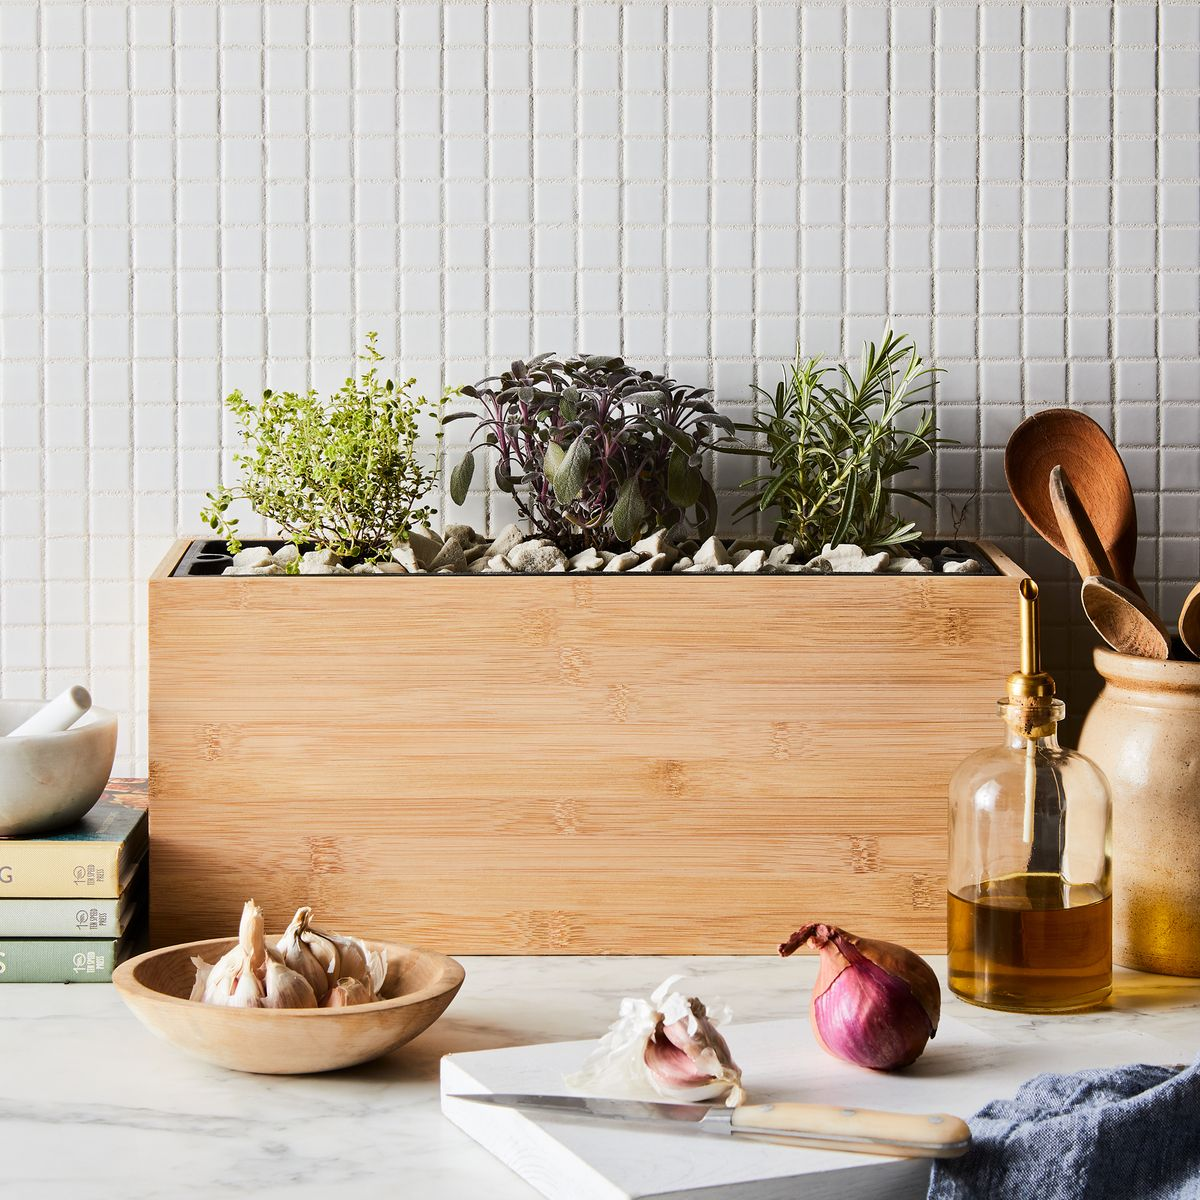 Image of: How To Start An Indoor Vegetable Herb Garden Small Garden Ideas